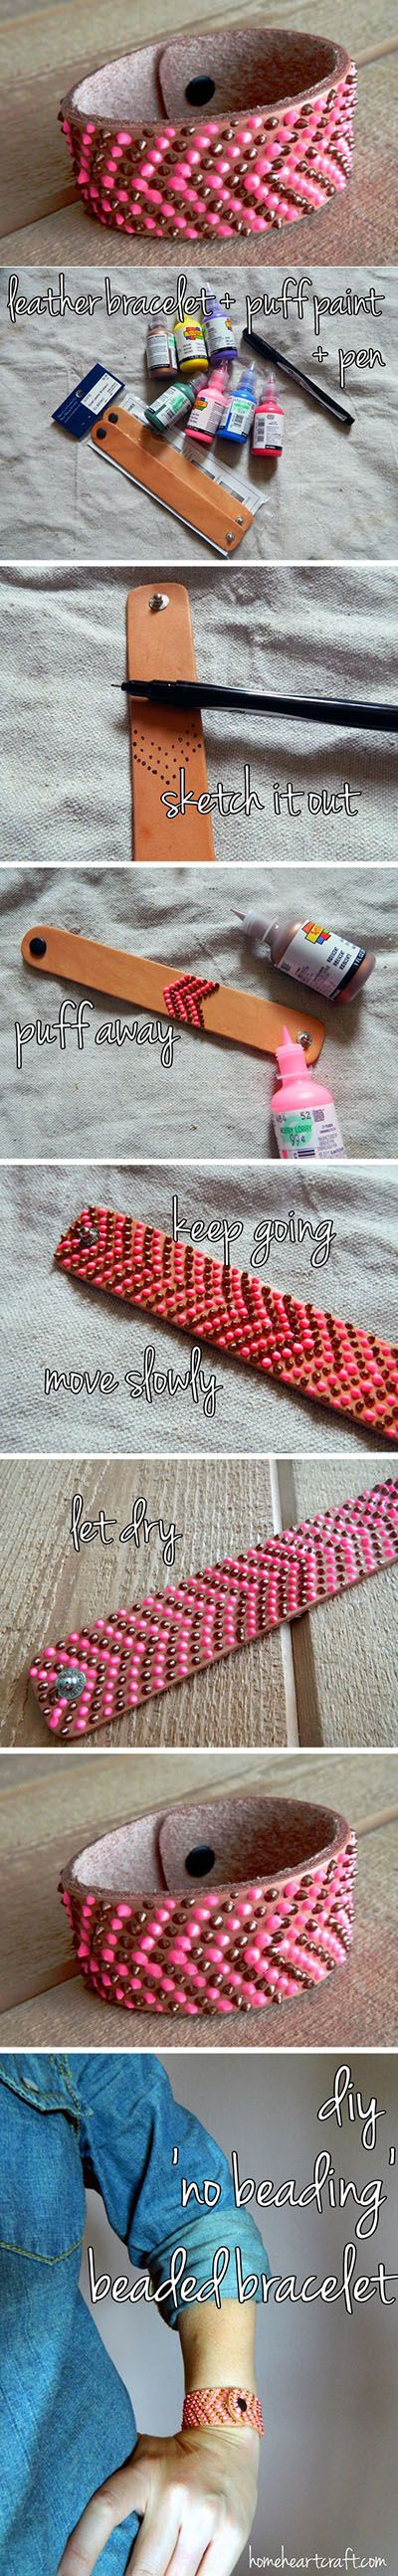 Diy Beautiful Pink Bracelet | DIY & Crafts Tutorials